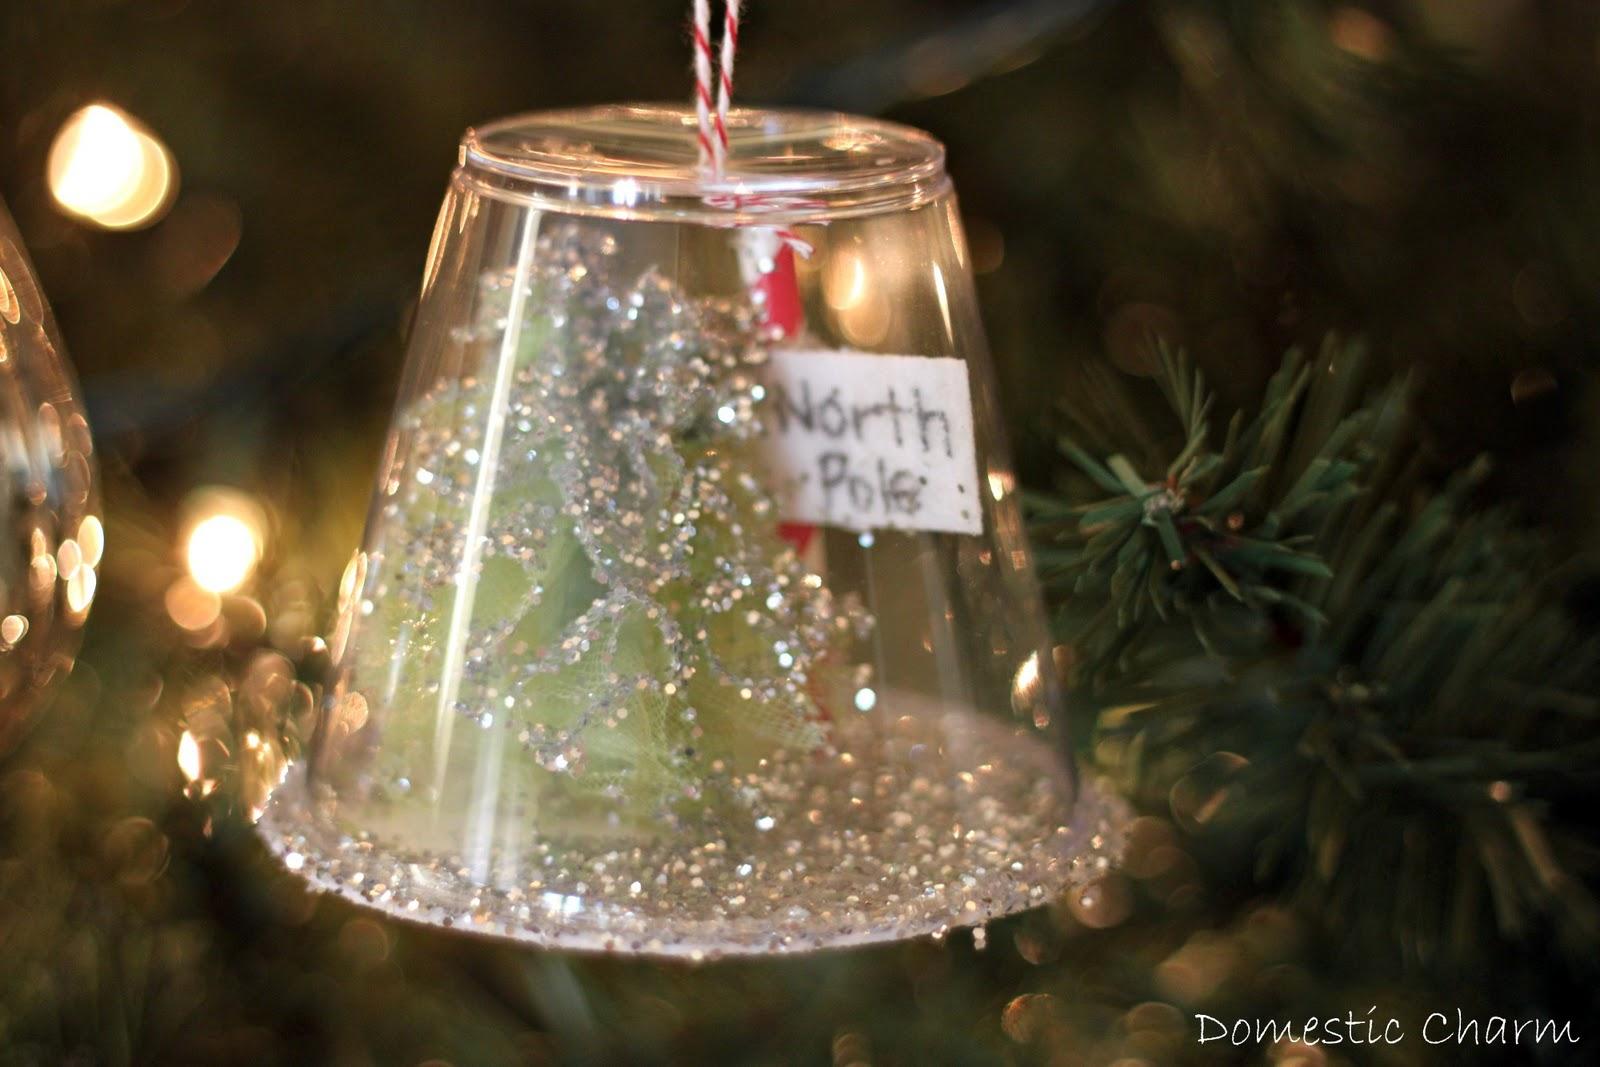 Domestic Charm: Homemade Christmas Ornament